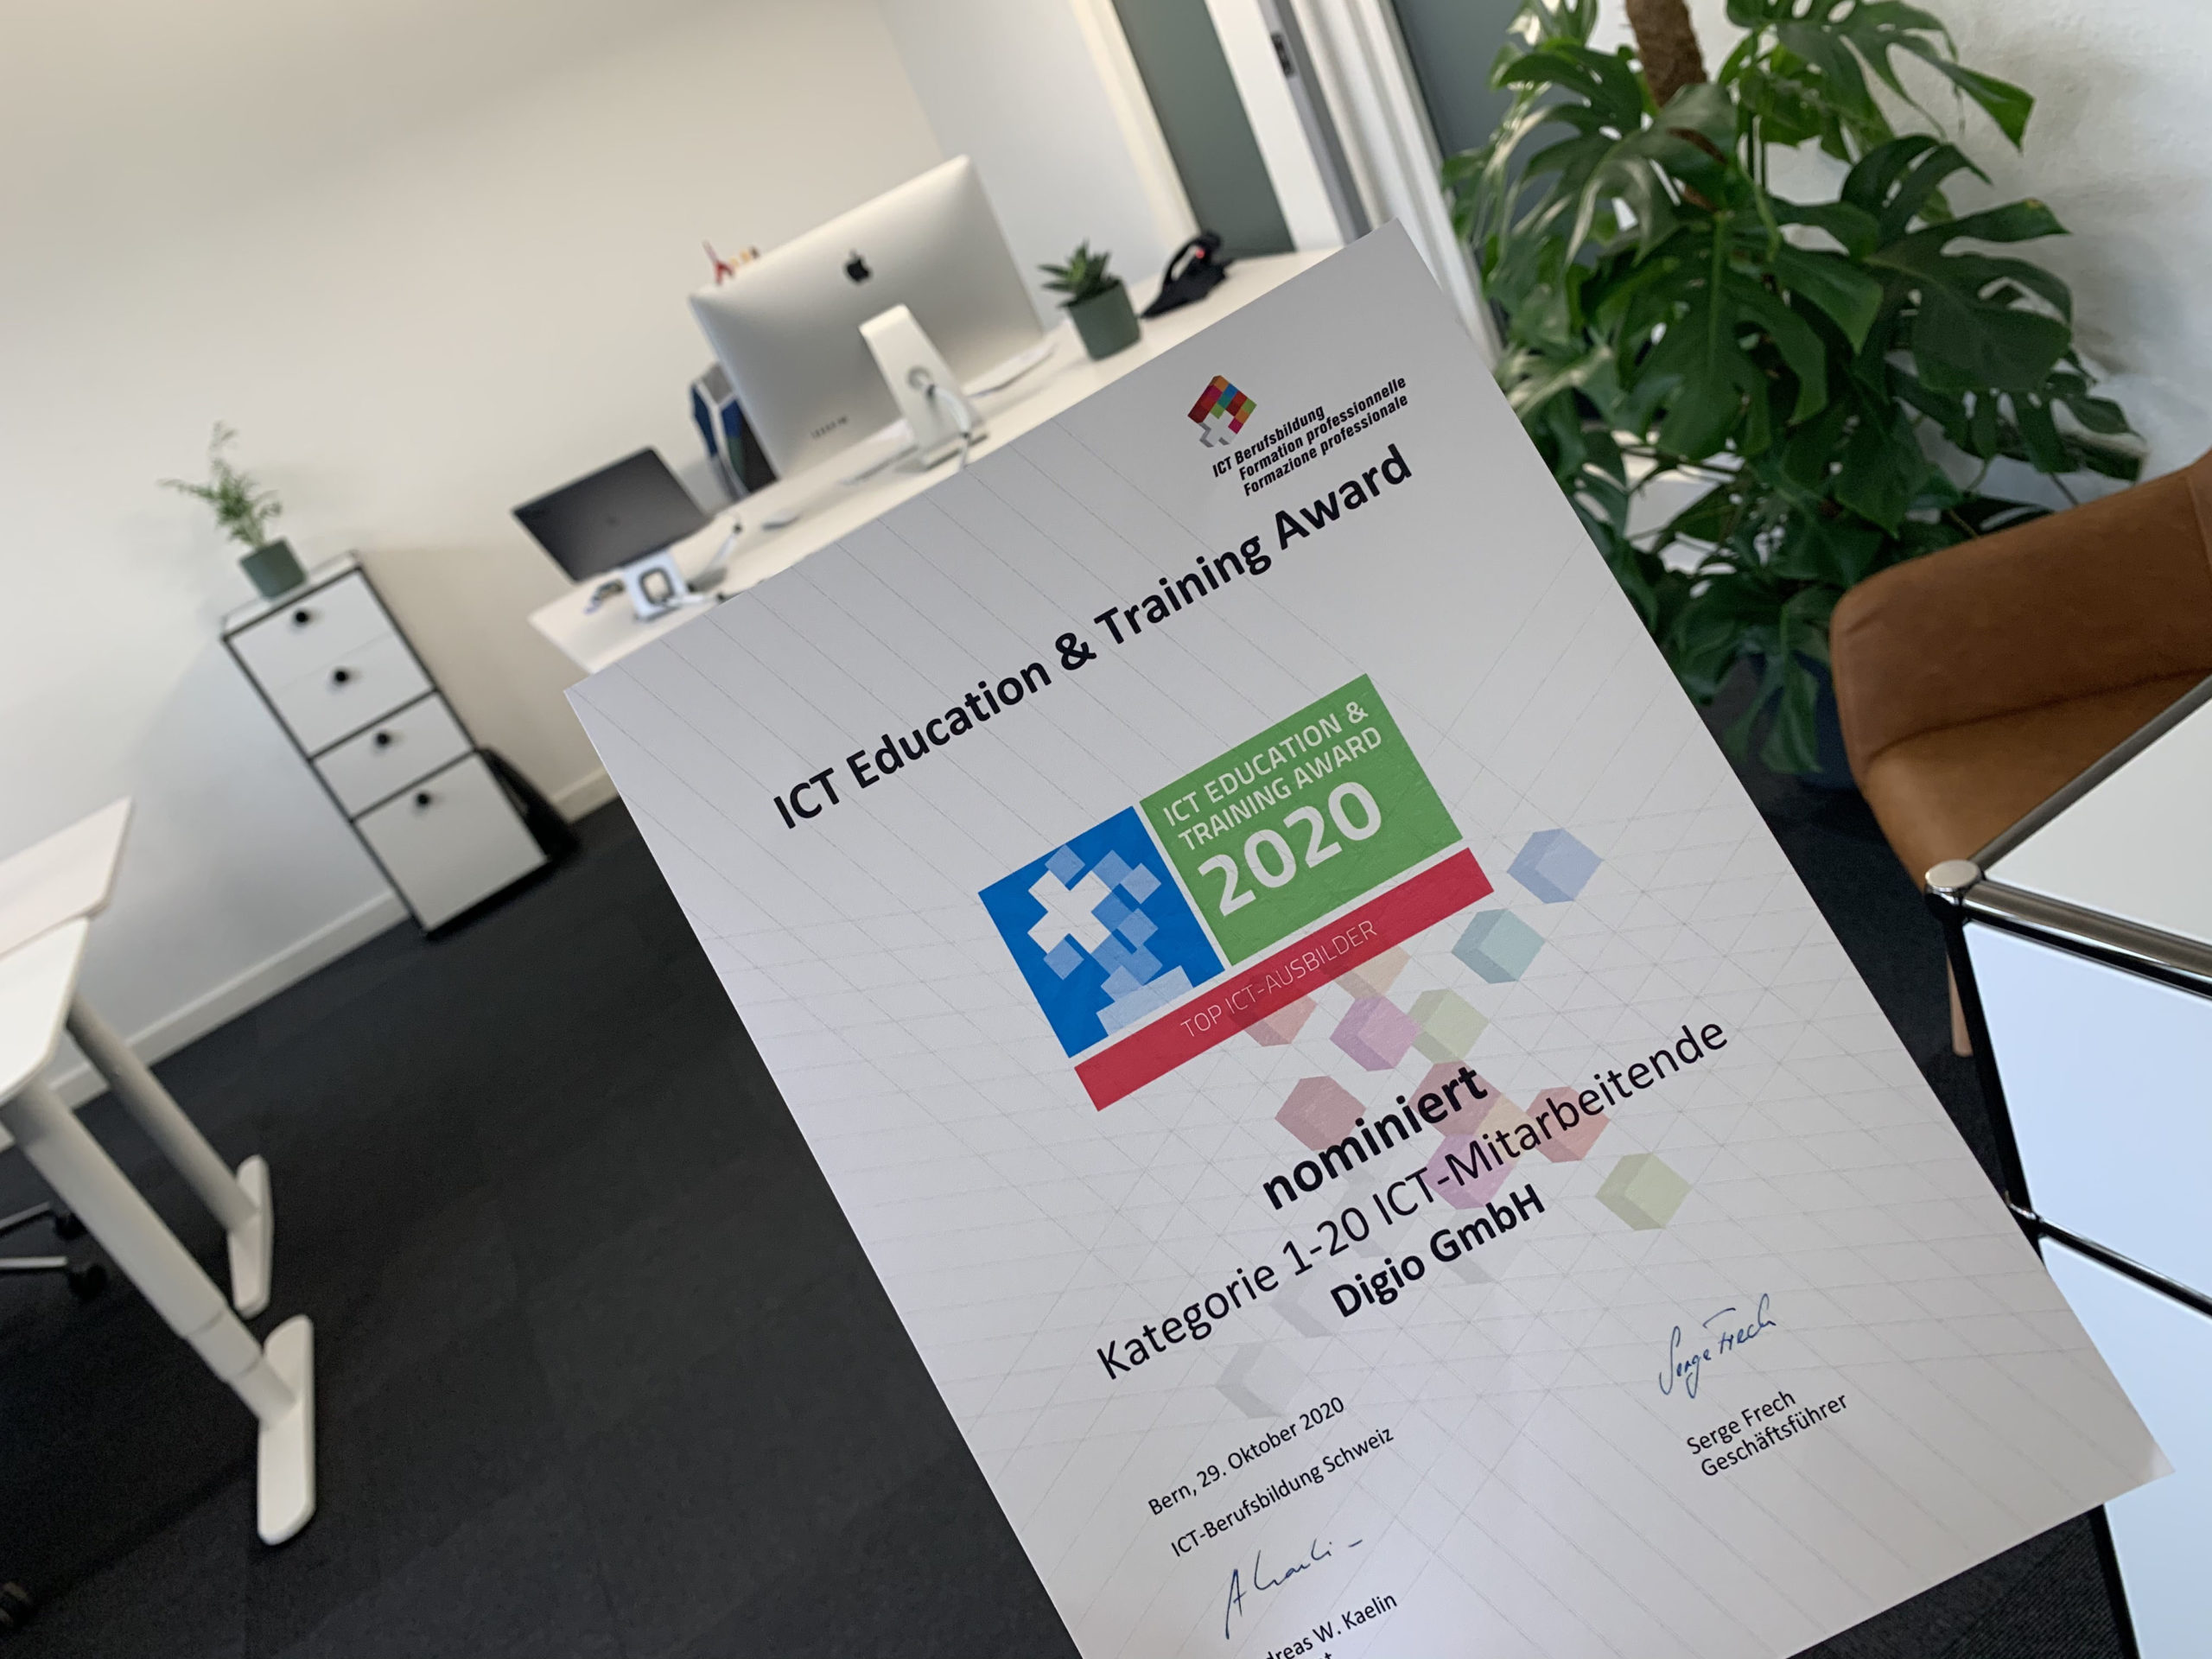 Digio ICT Award 2020 Nomination